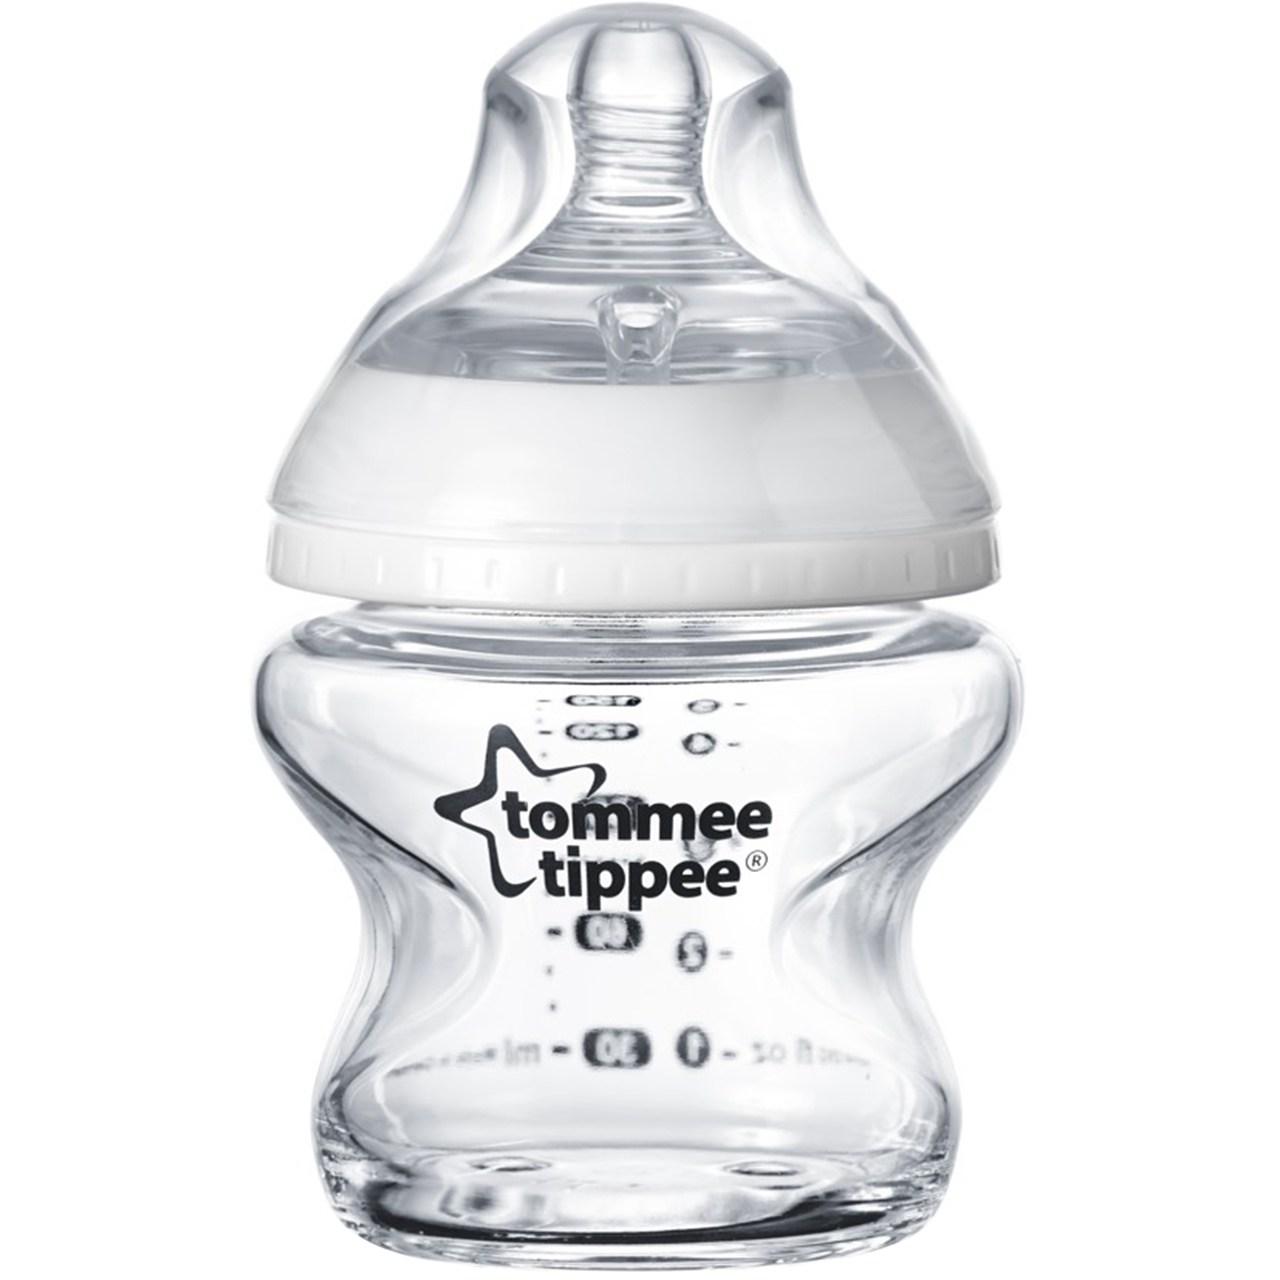 شیشه شیر تامی تیپی مدل 42243777 ظرفیت 150 میلی لیتر